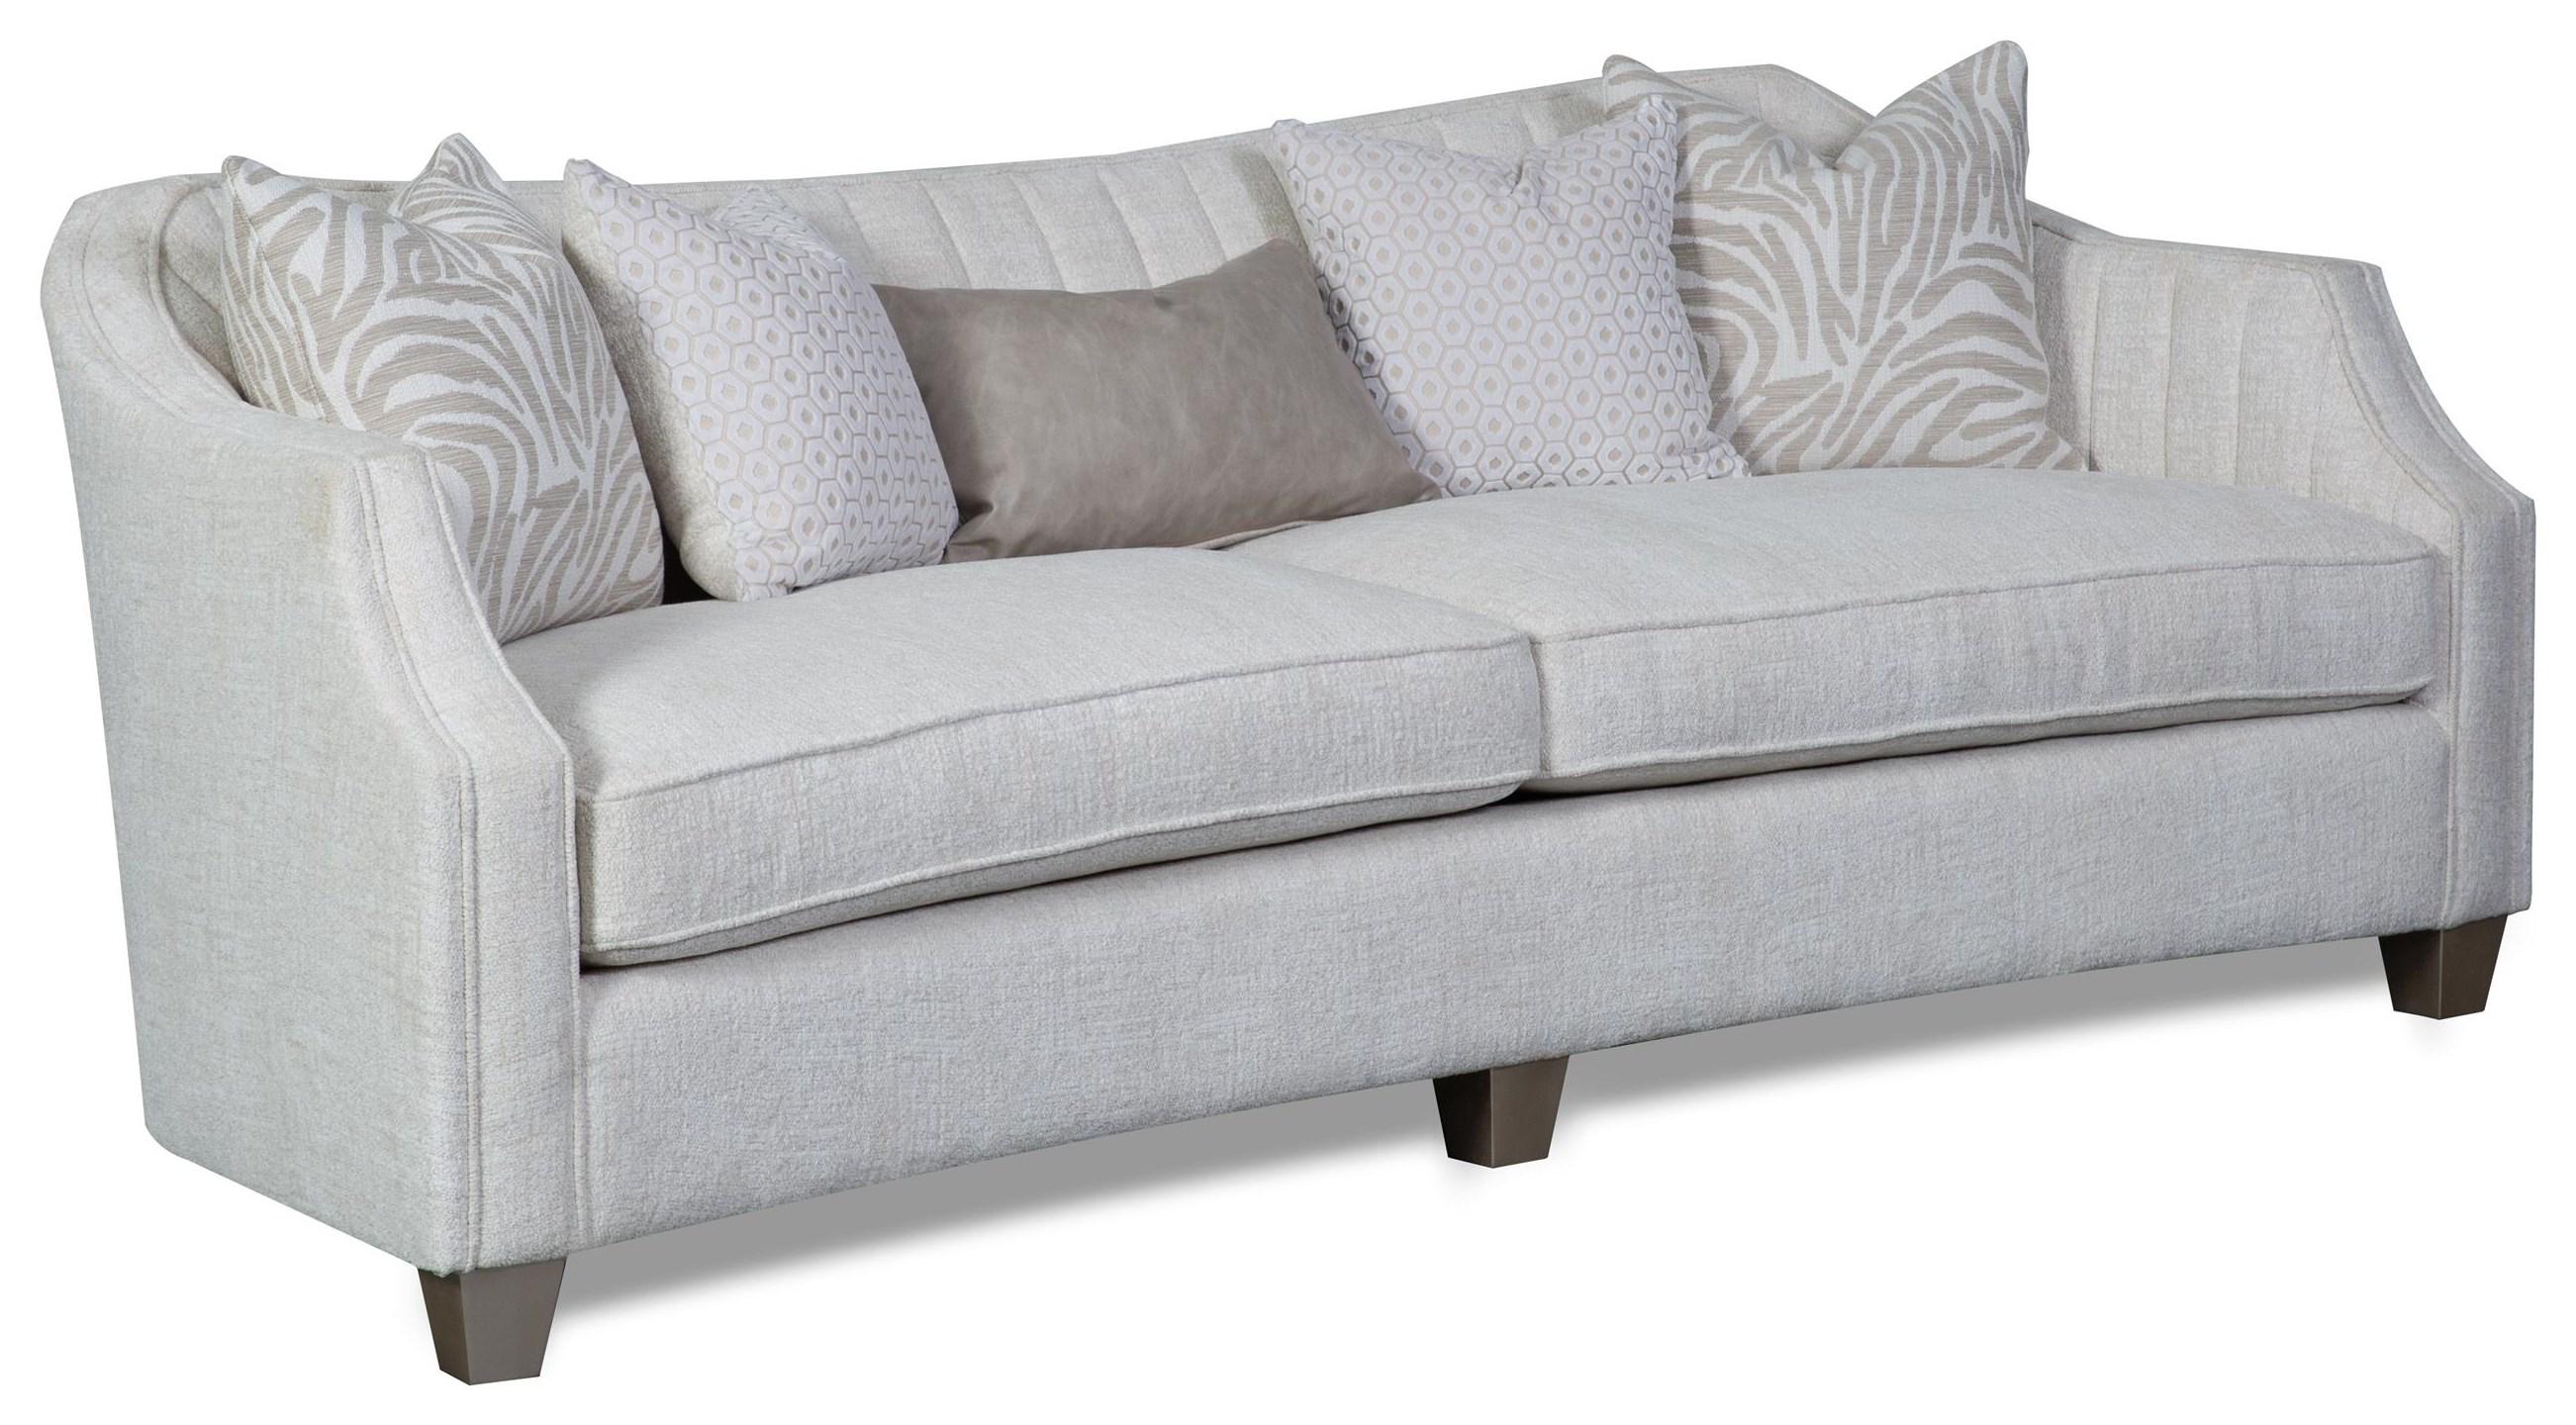 Alaina Sofa by Aria Designs at Stoney Creek Furniture